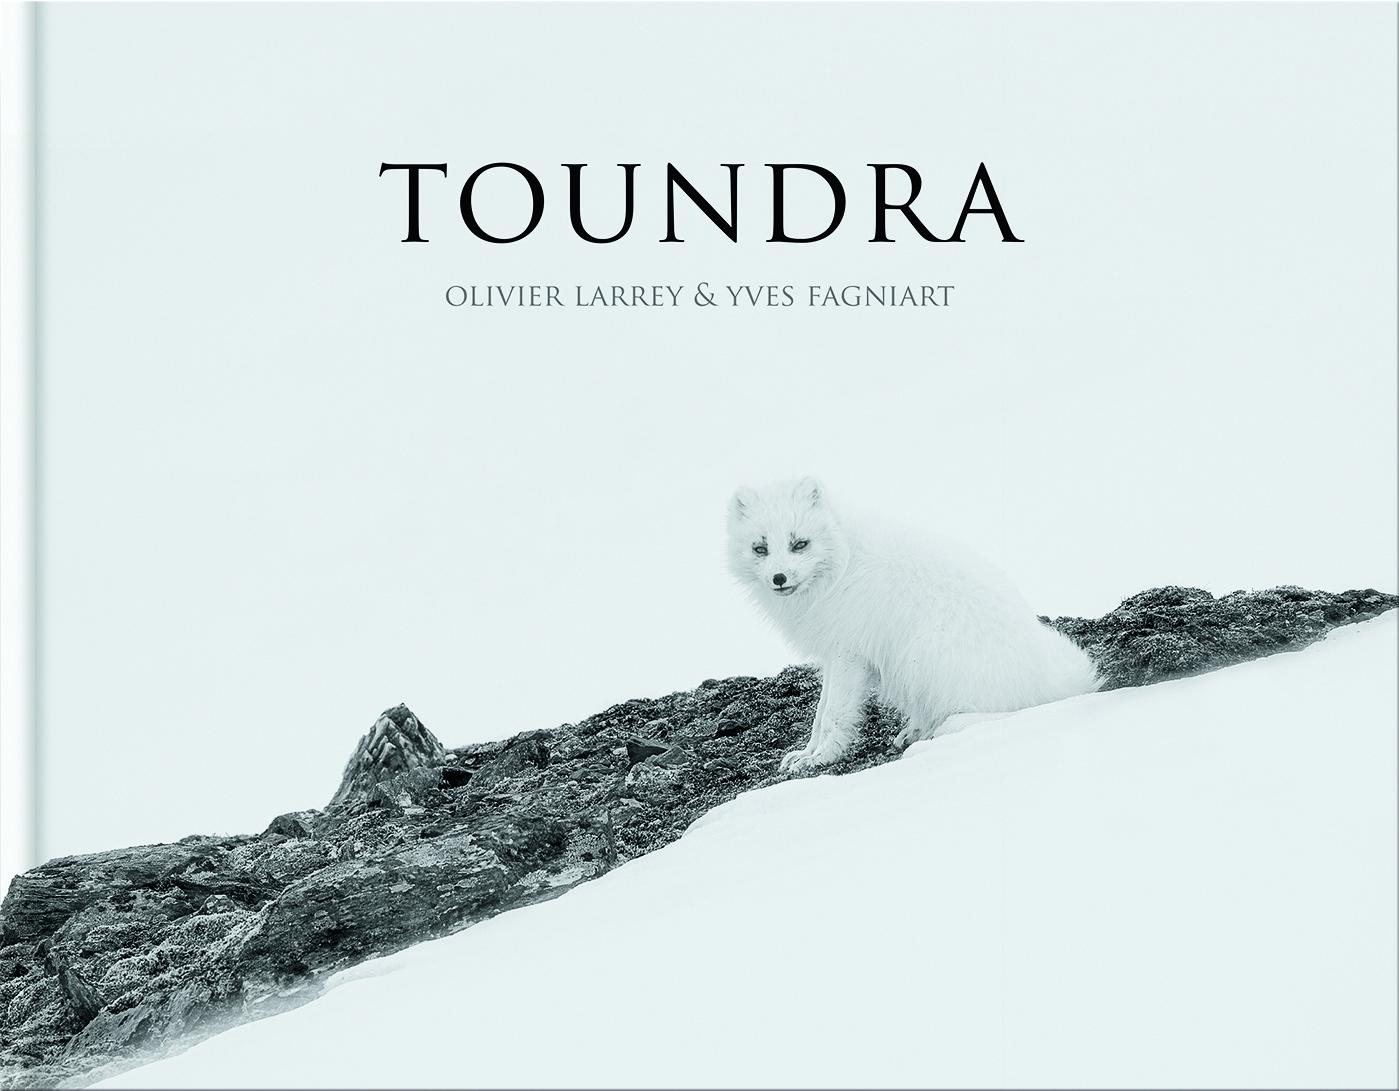 510_couv-toundra.jpg -